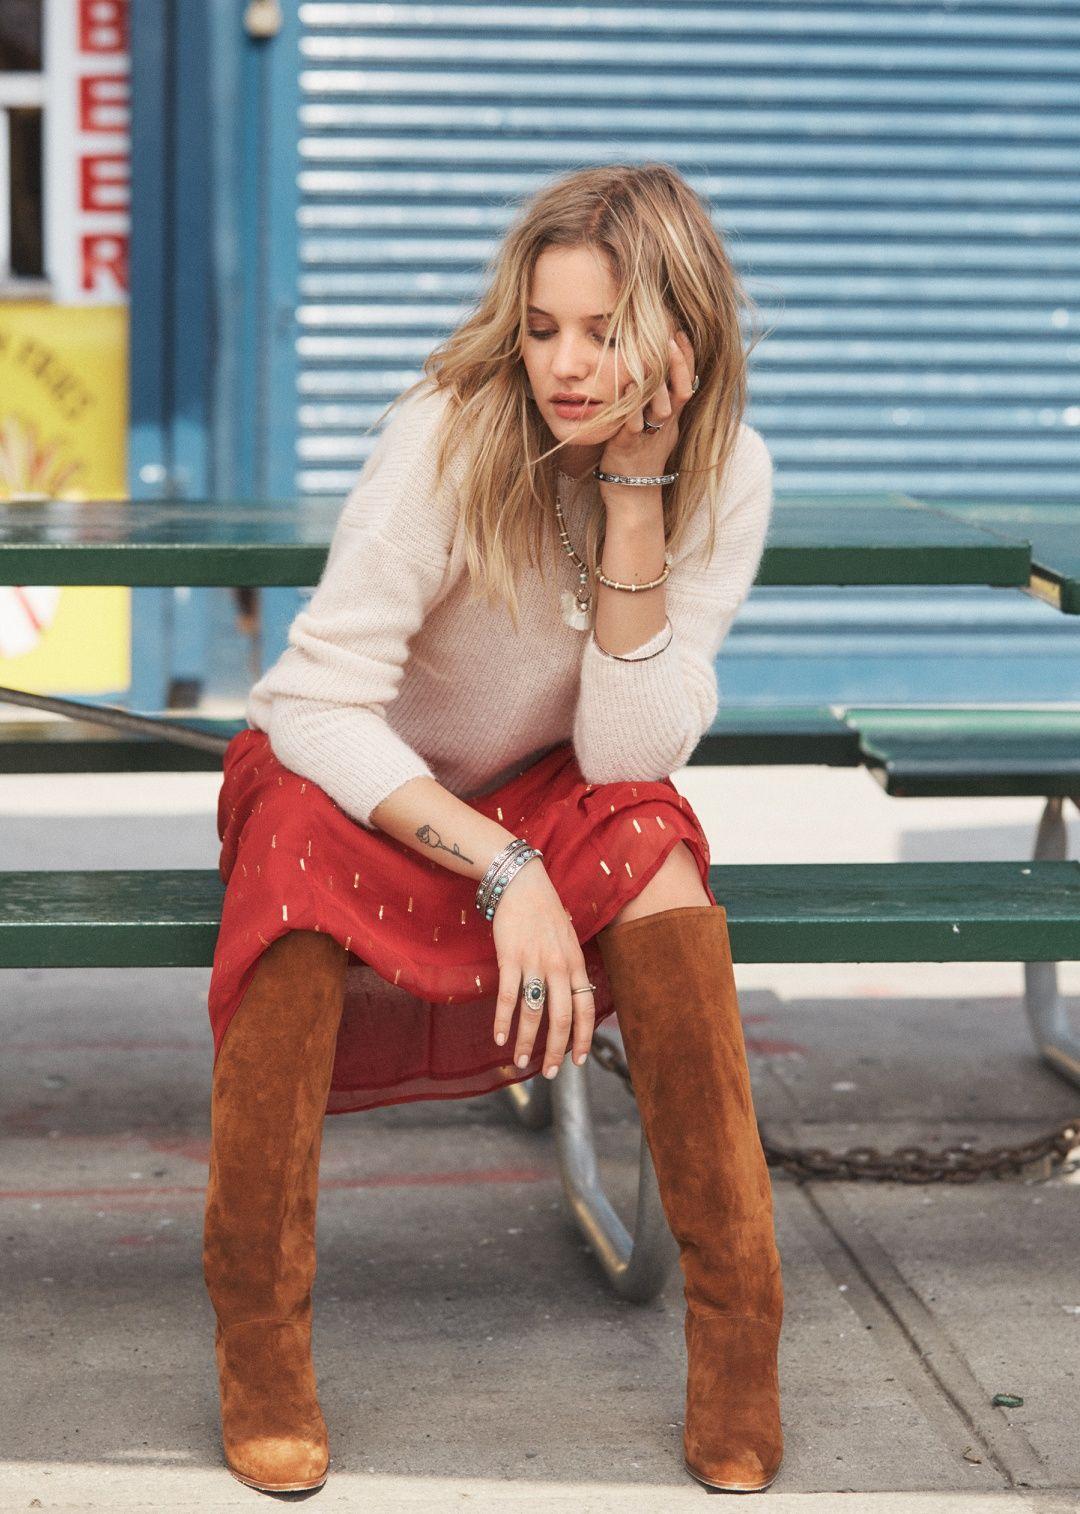 Sézane Abby Boots Fashion, Sezane, Feminine style